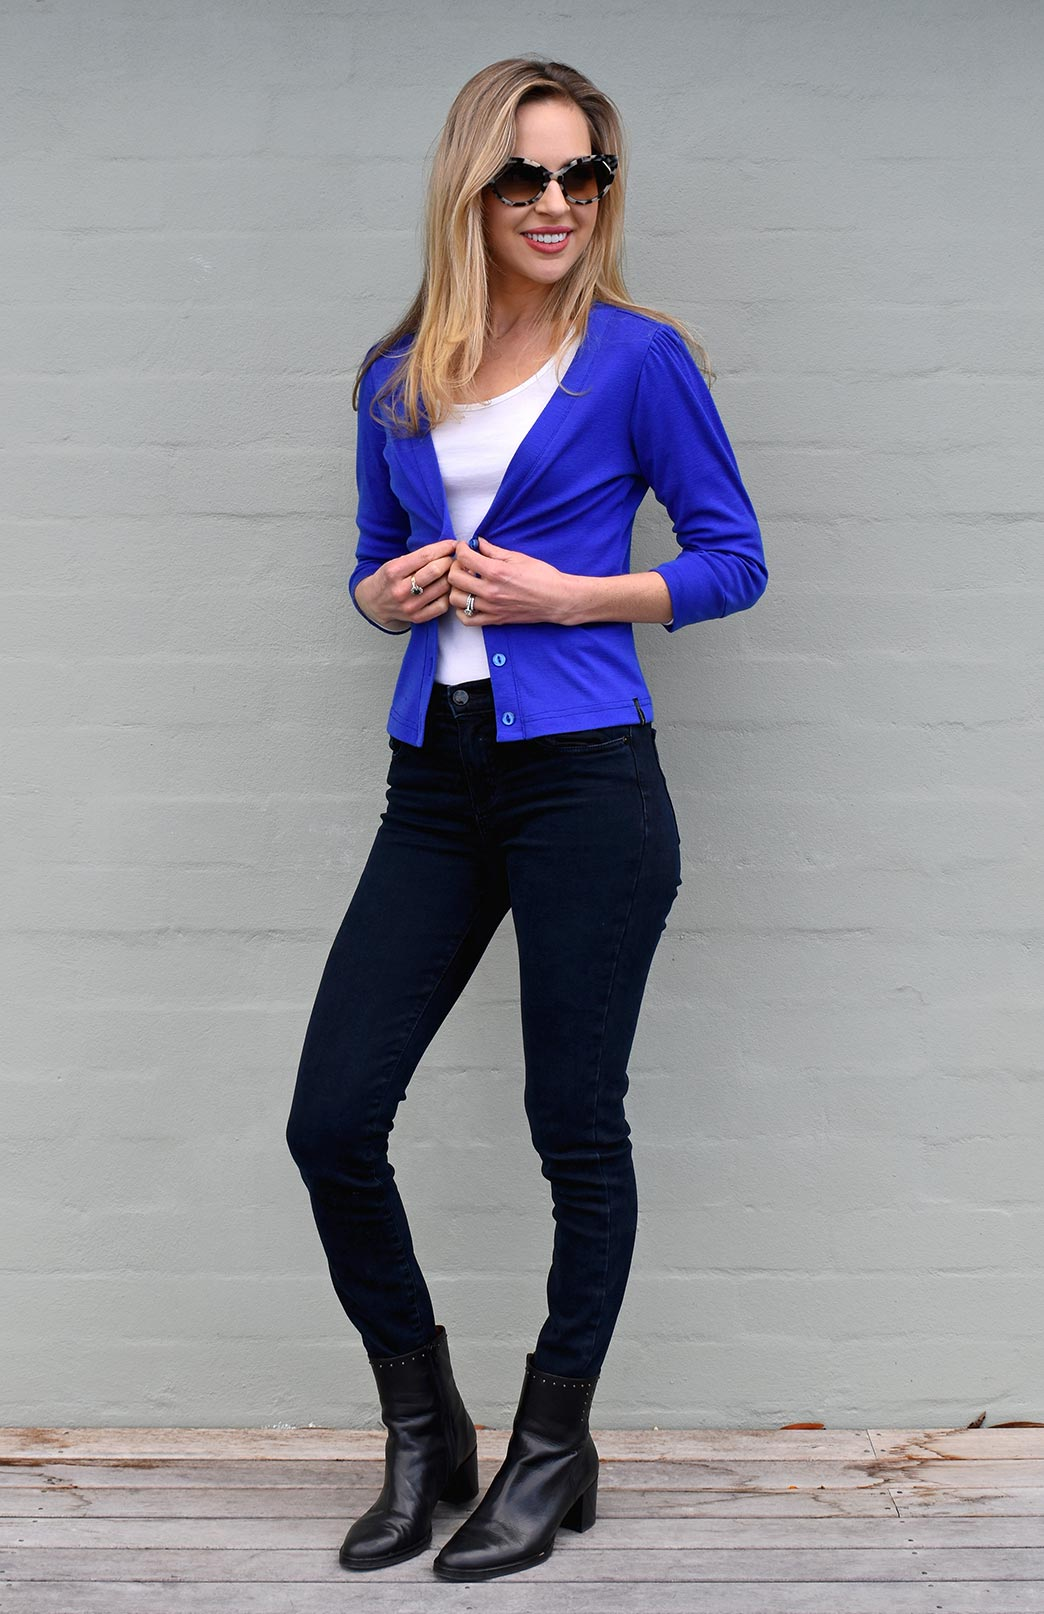 Crop Cardigan - 3/4 Sleeve - Women's Blue Crop Short Cardigan with 3/4 Sleeves and Buttons - Smitten Merino Tasmania Australia